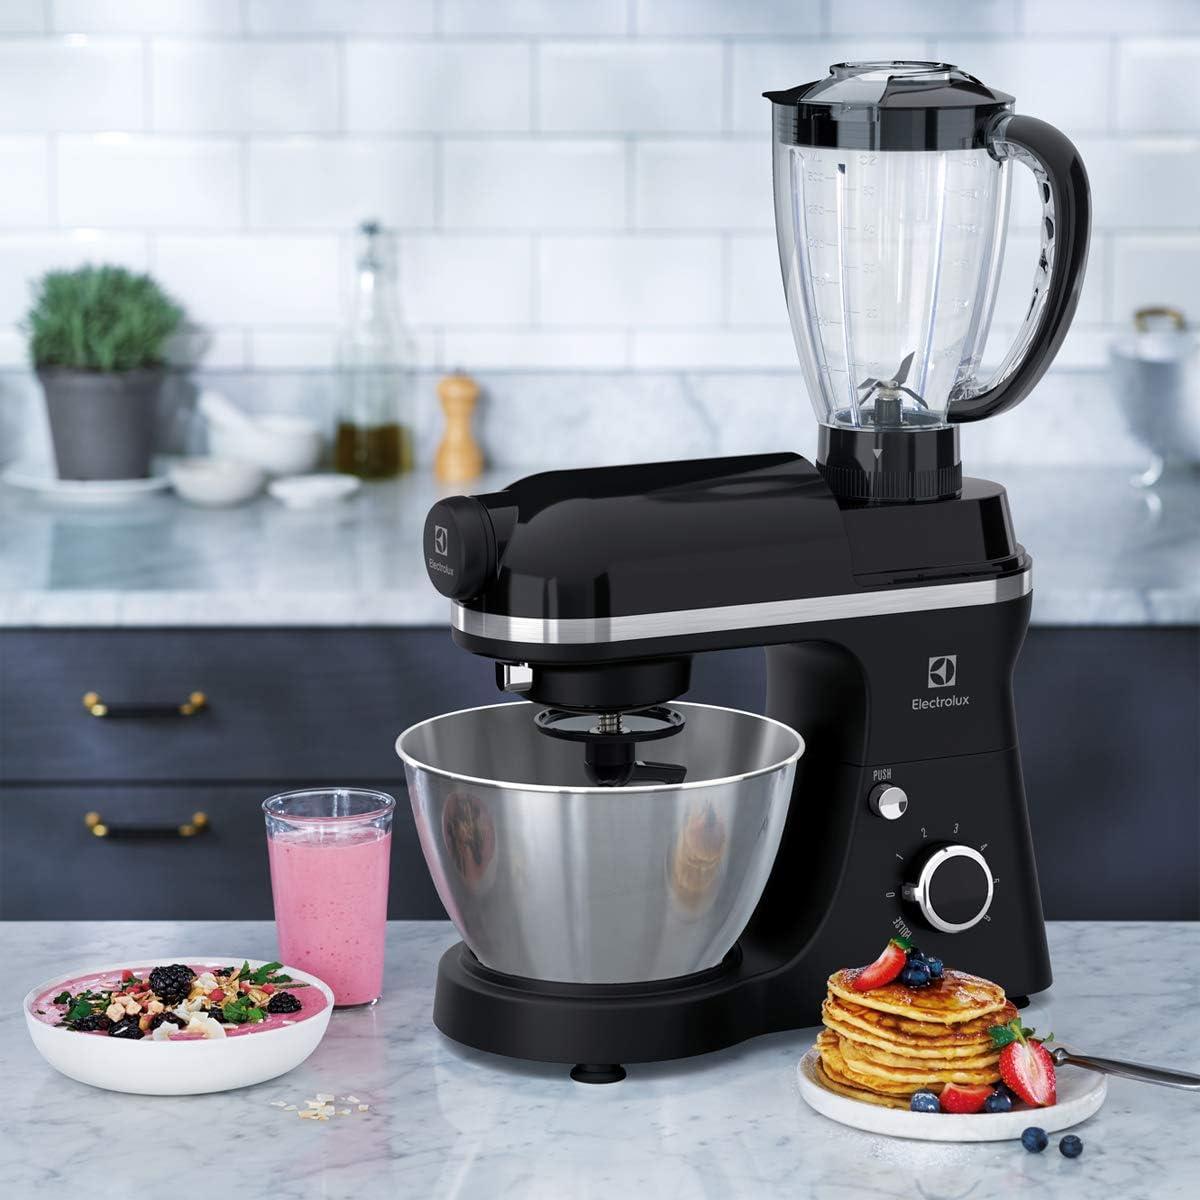 Electrolux EKM3700 800W 4L Negro - Robot de cocina (4 L, Negro, Giratorio, 1,2 m, Metal, Acero inoxidable): Amazon.es: Hogar